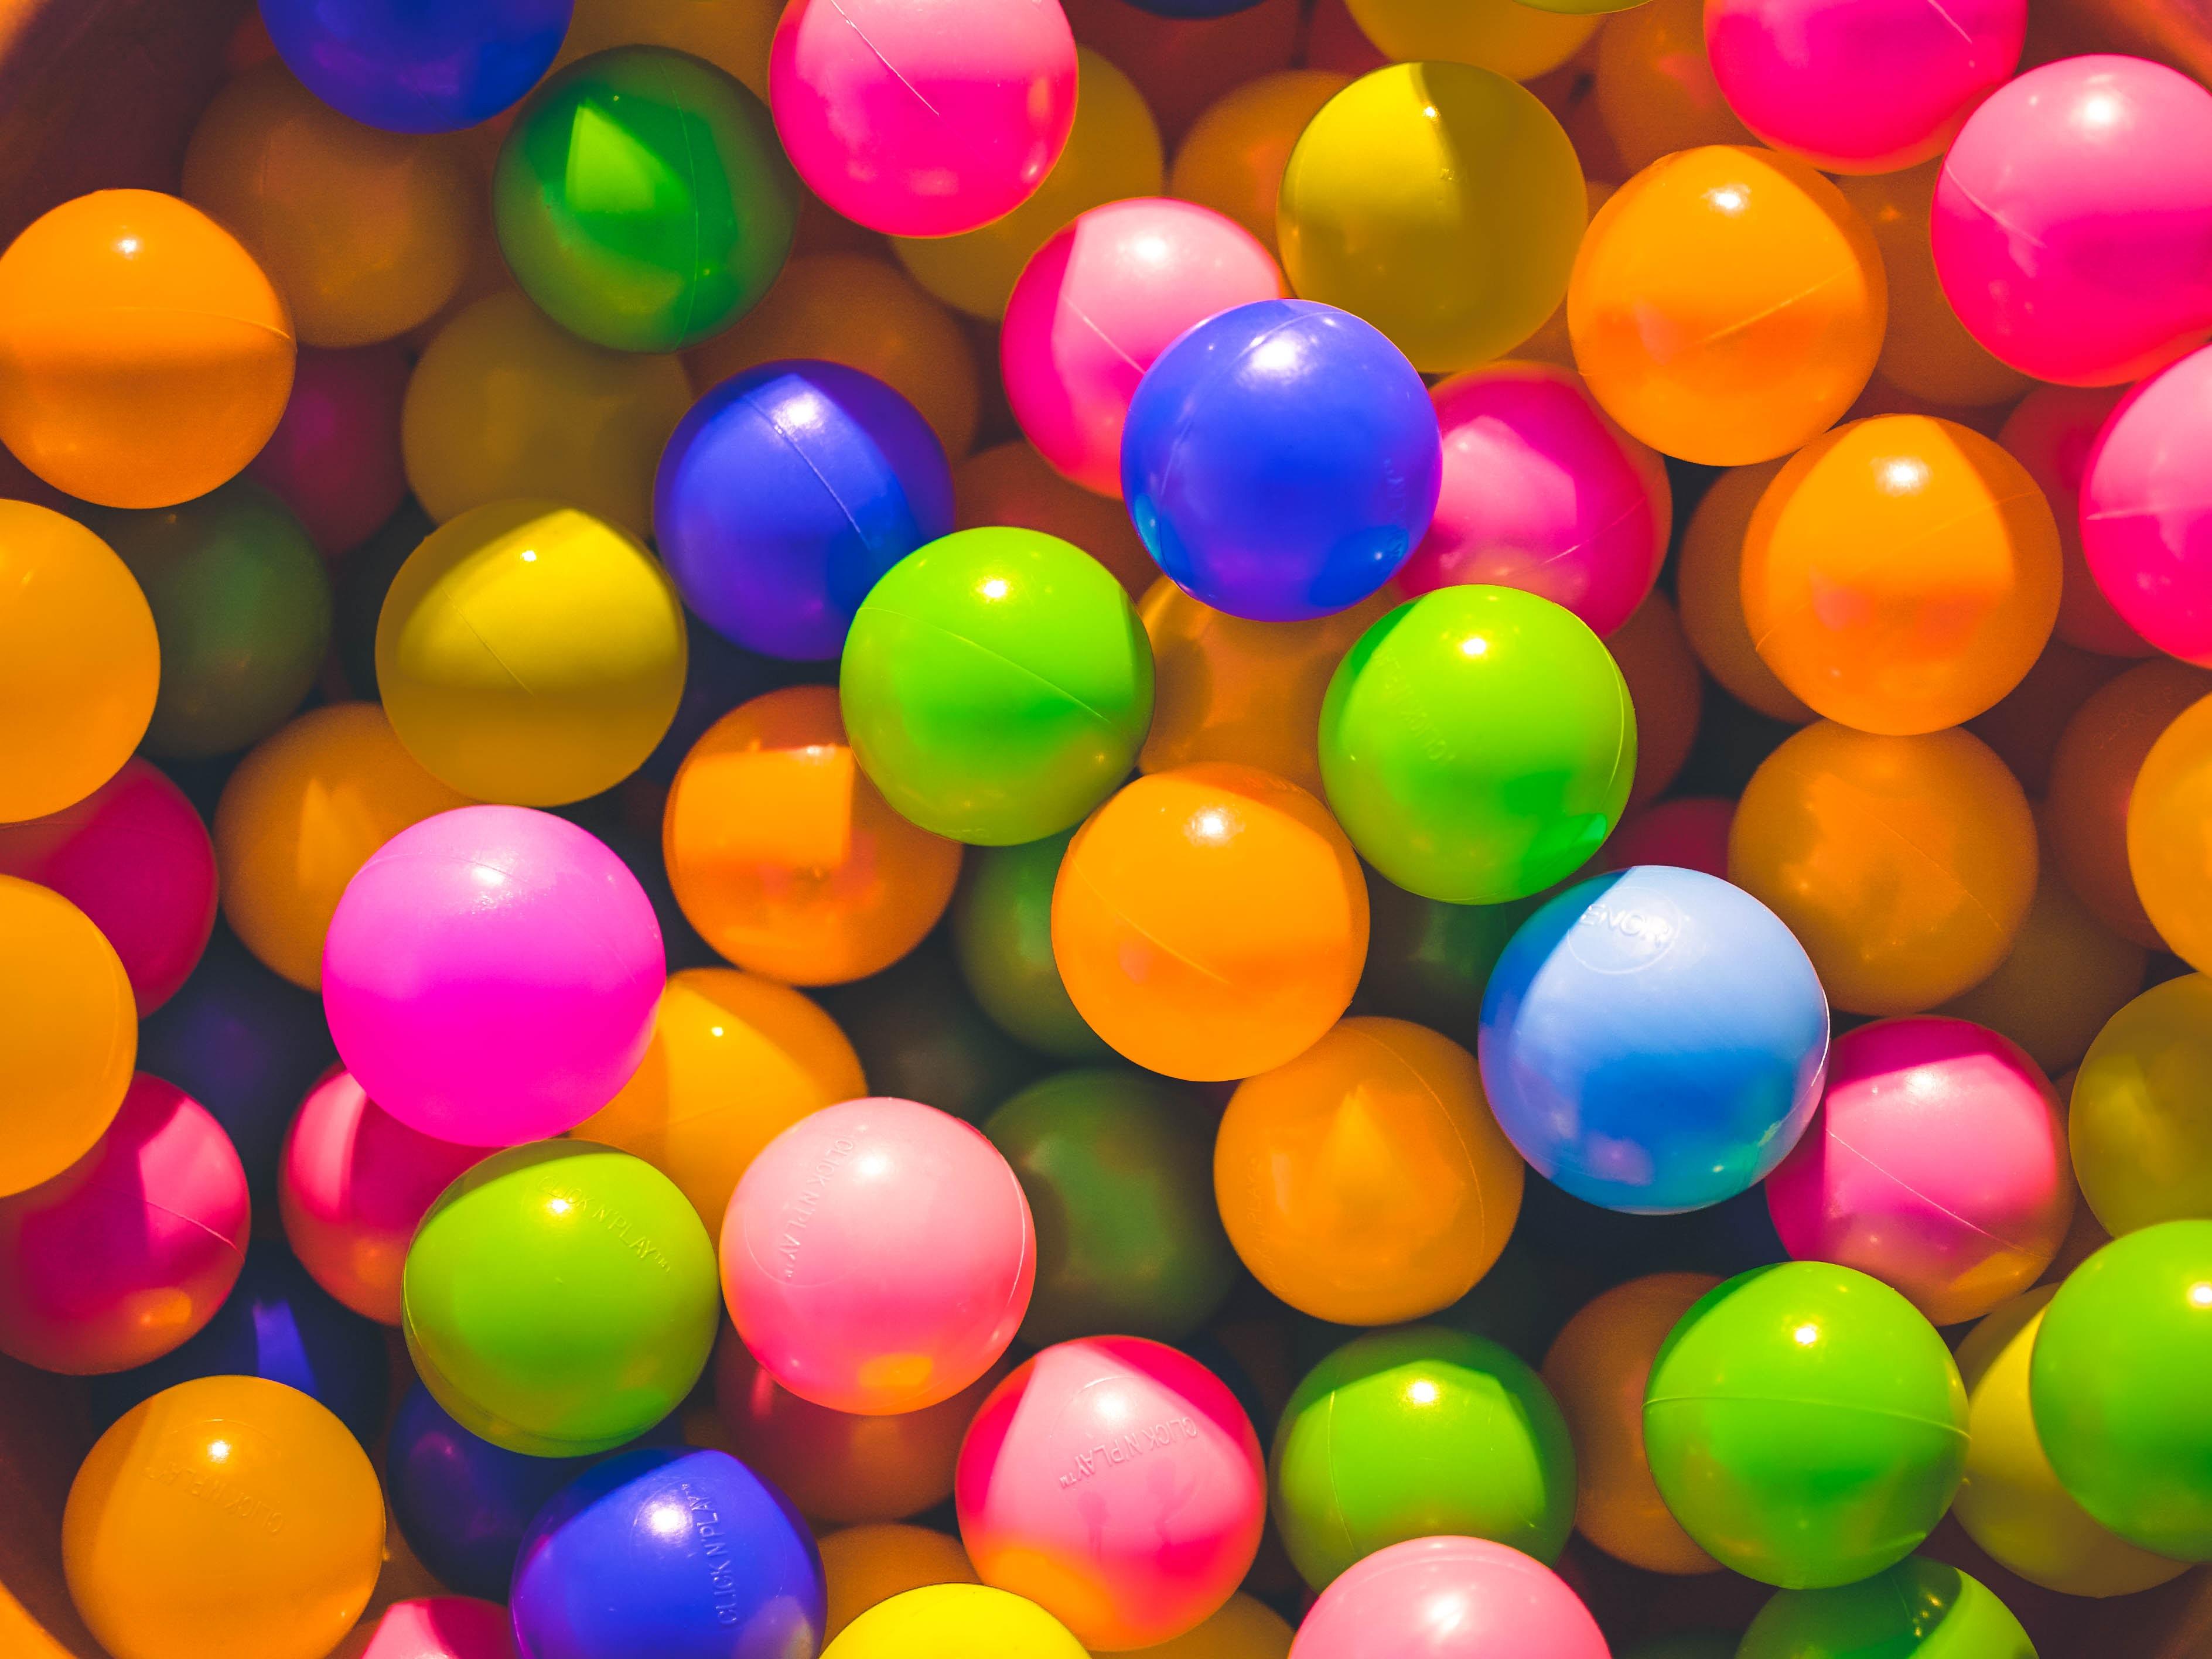 5 Ways to Make Your Employee Benefit Presentations Fun